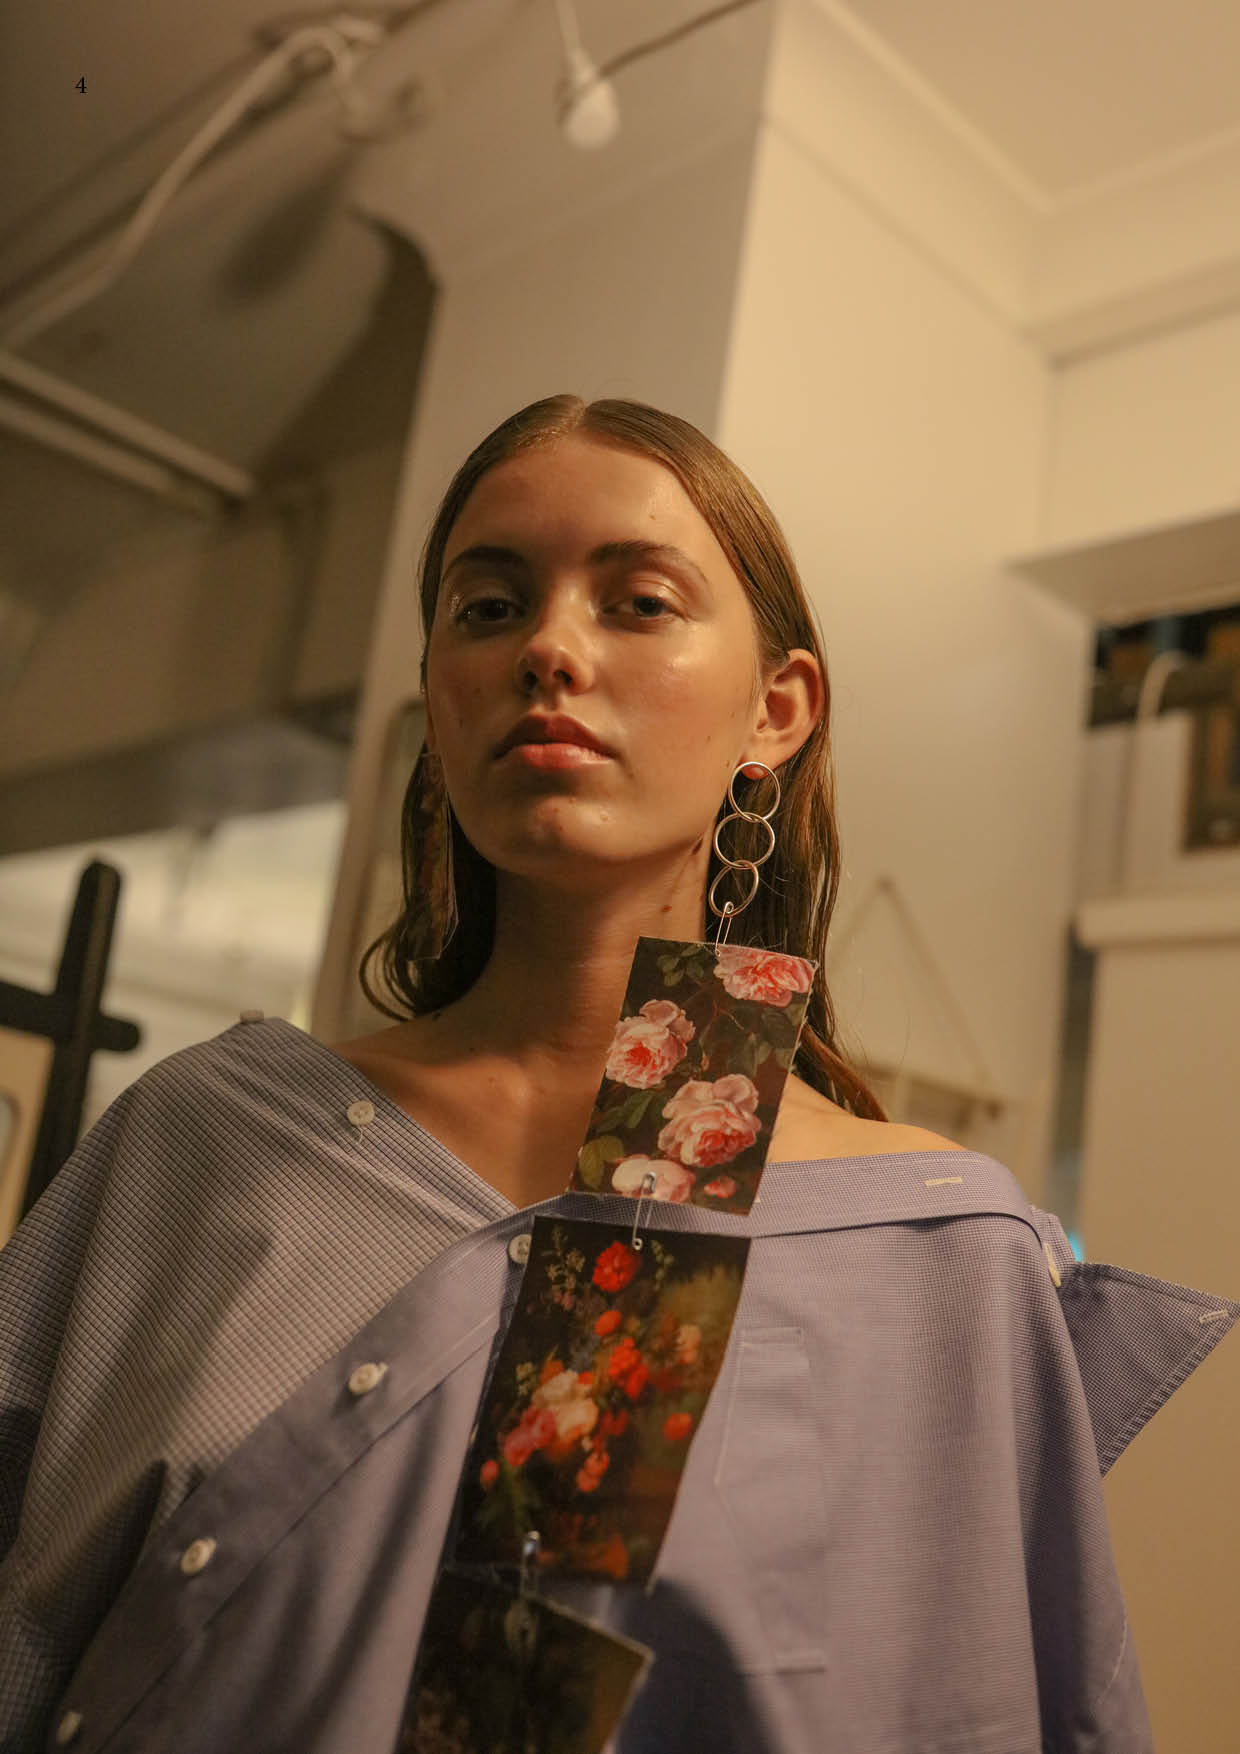 Sarah wears Samantha Diorio & Jake Paraskeva necklace/earring tags, Samantha Diorio shirt